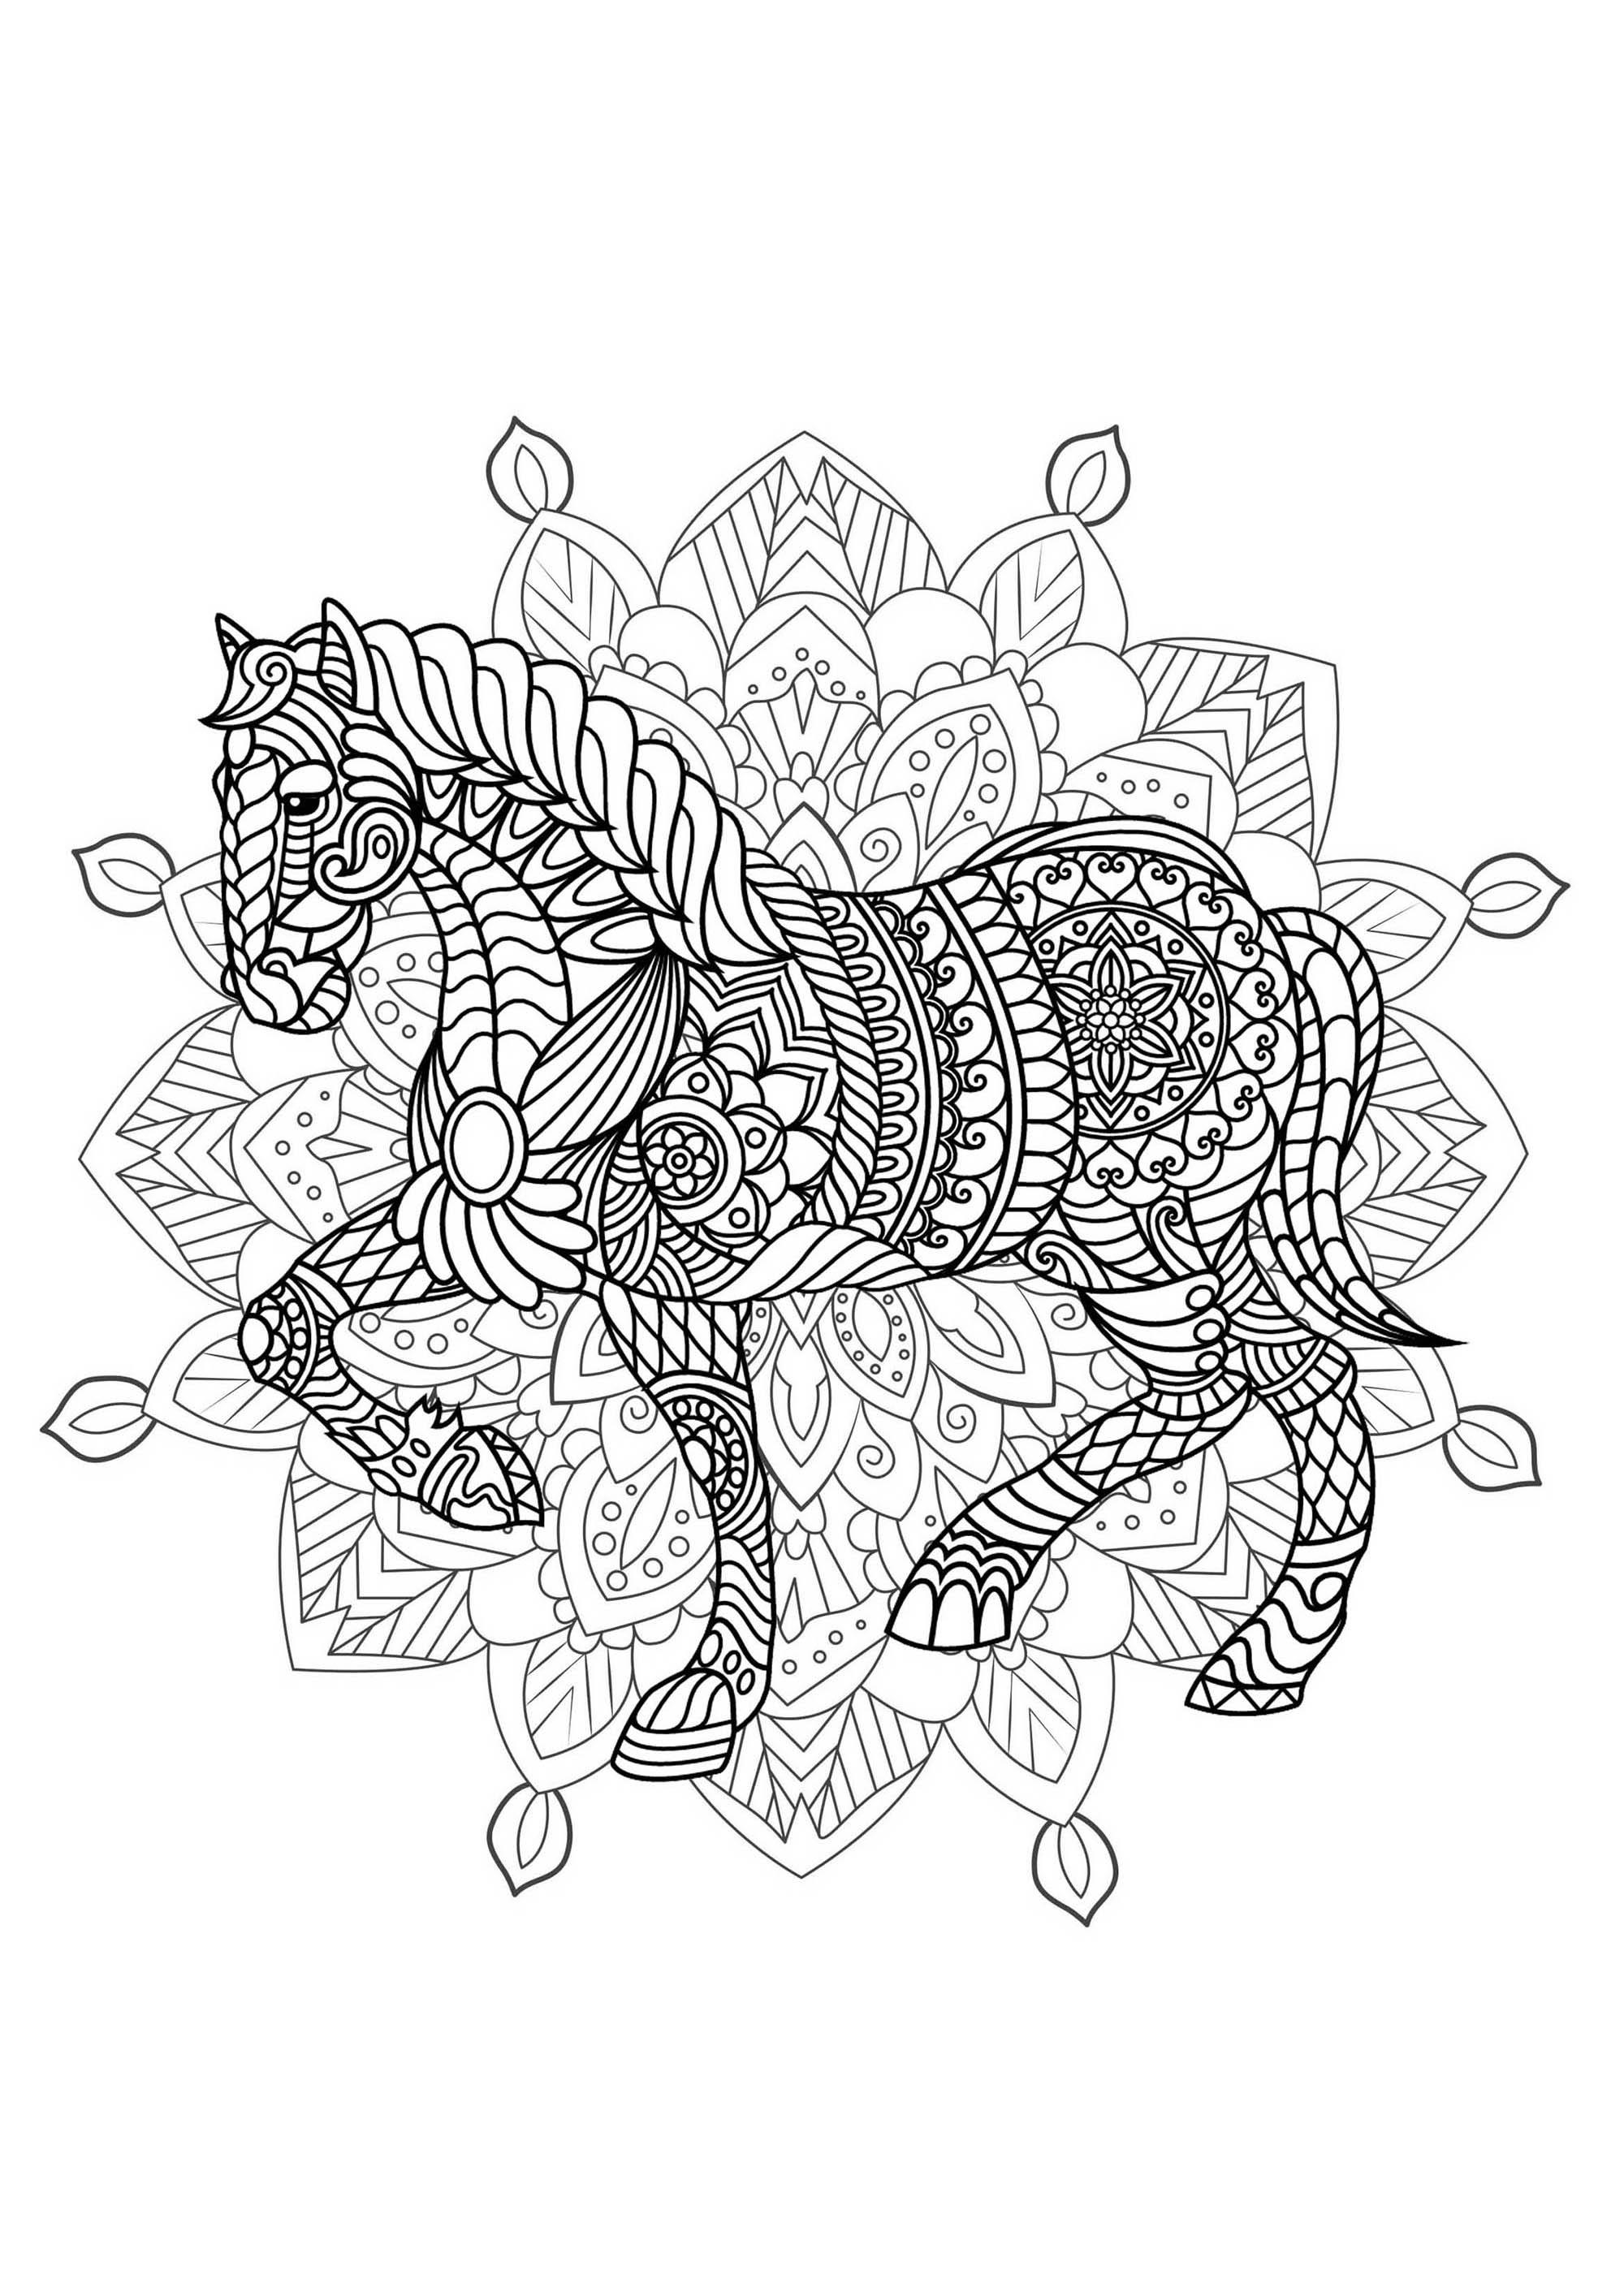 Mandala With Elegant Horse And Complex Patterns - M&Alas avec Coloriage De Mandala Difficile A Imprimer